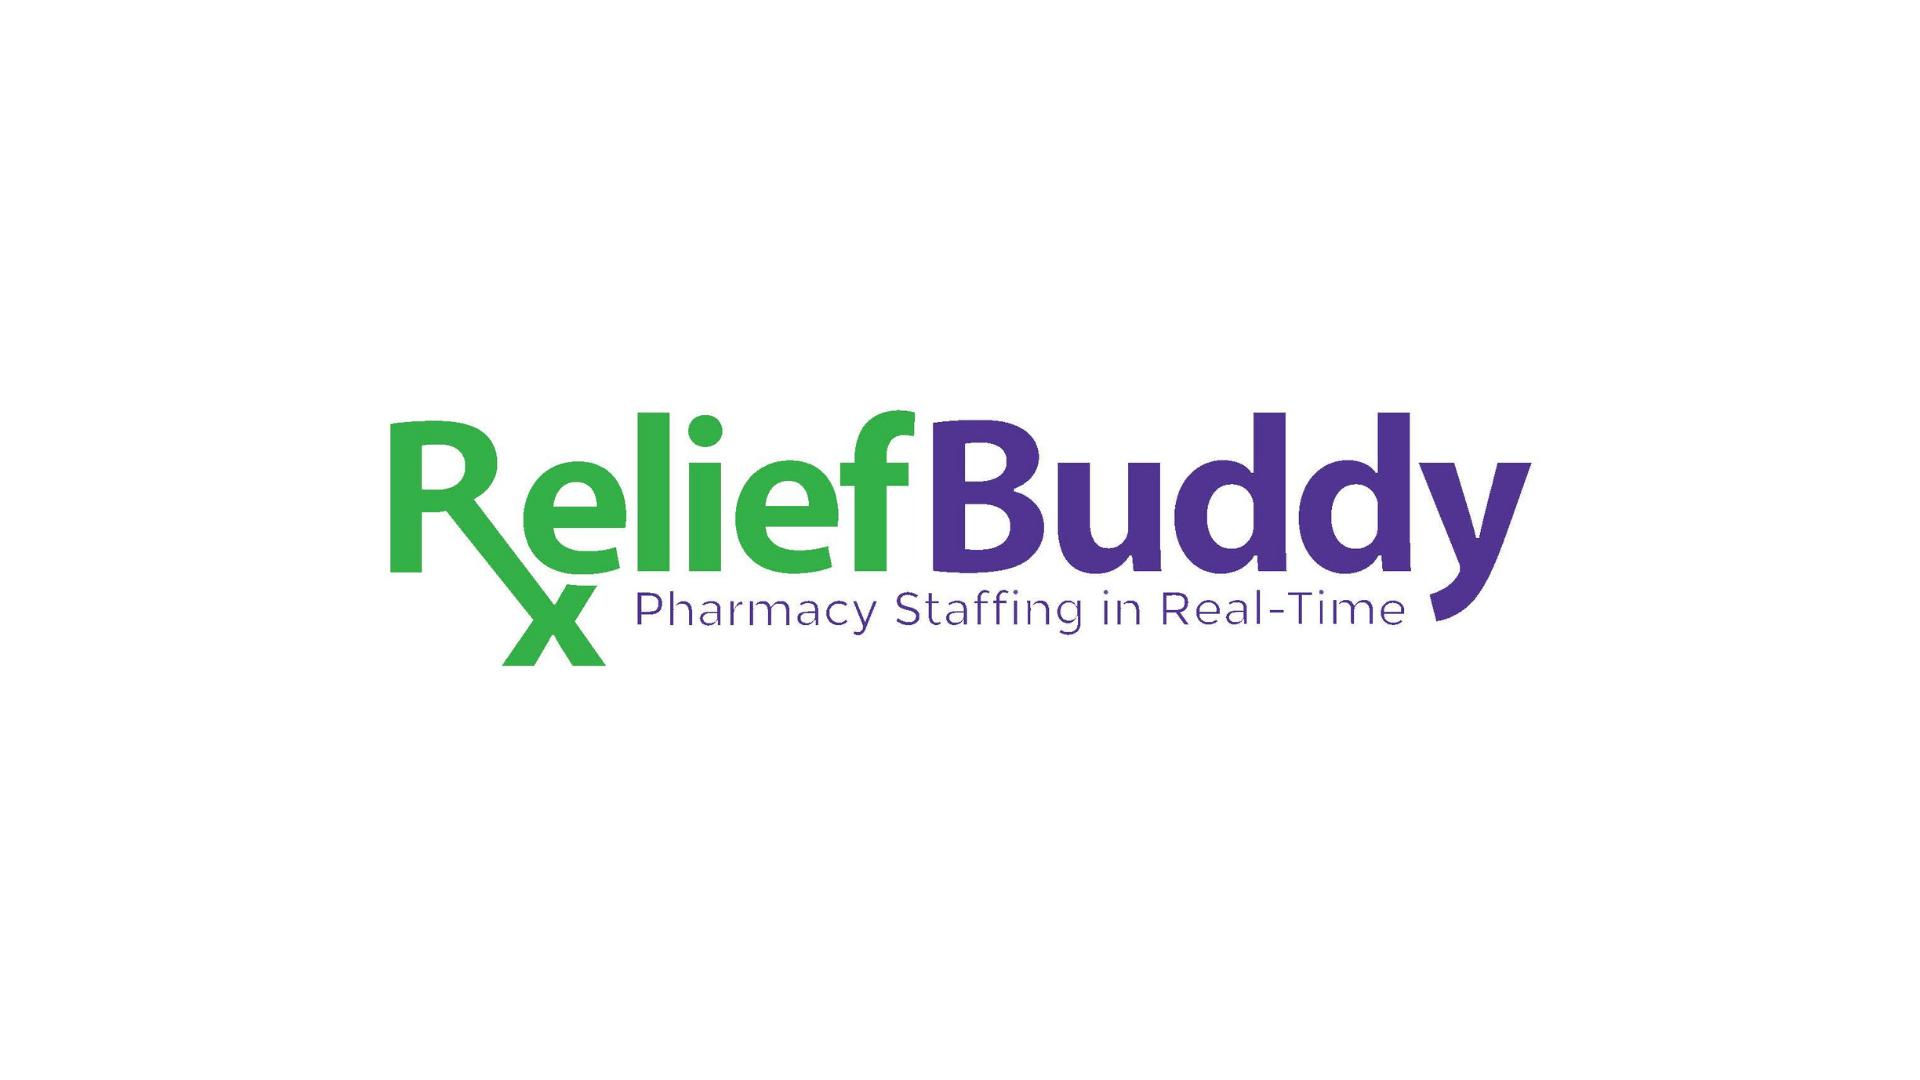 Relief Buddy Partnership